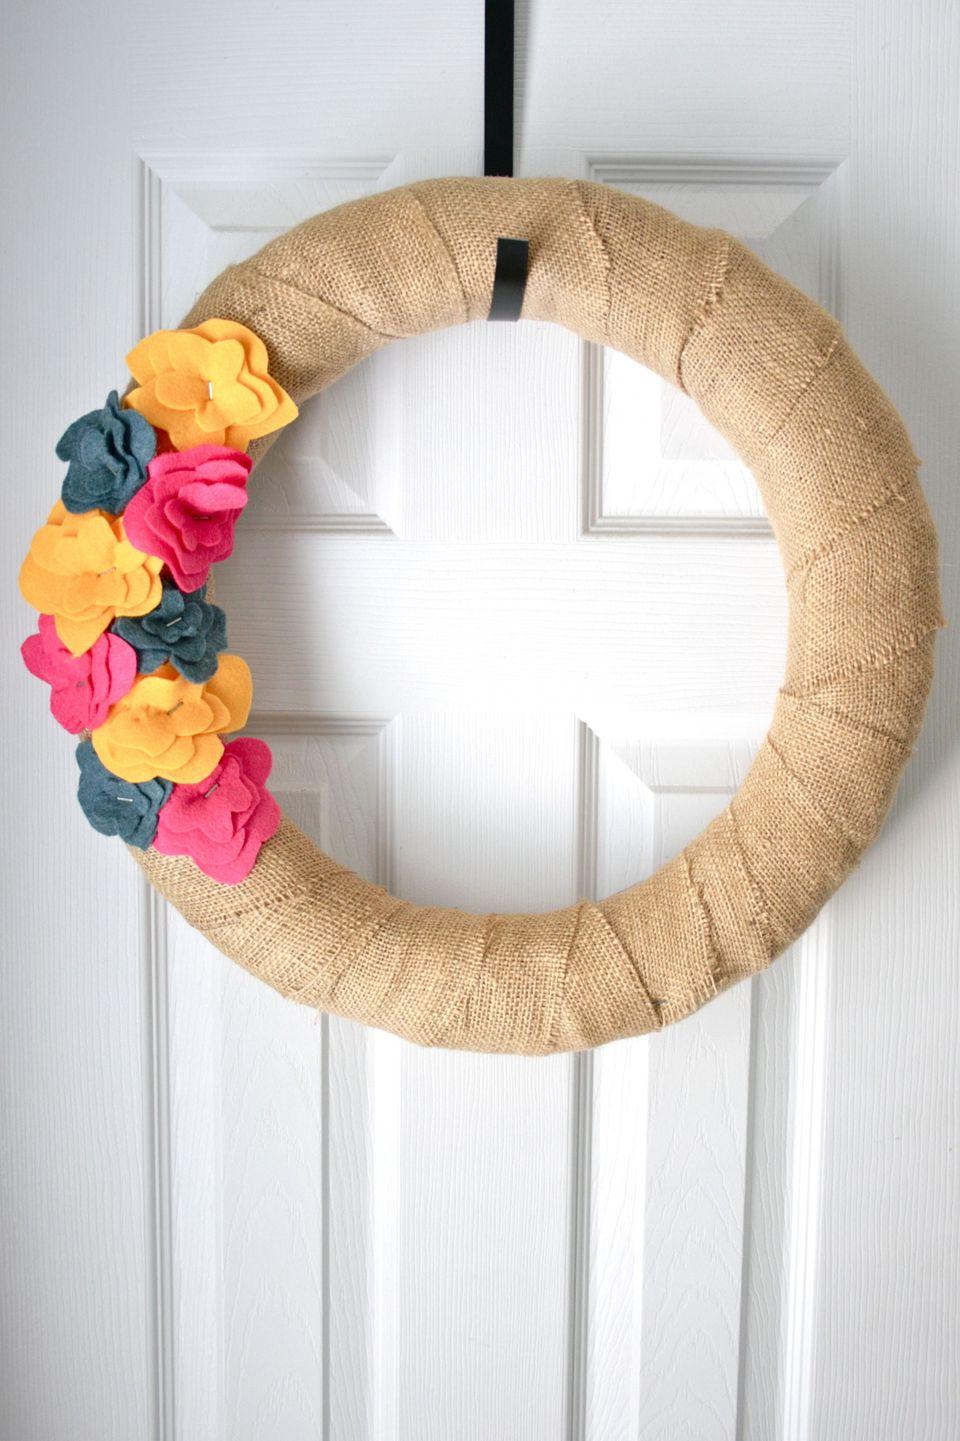 DIY Burlap Floral Wreath